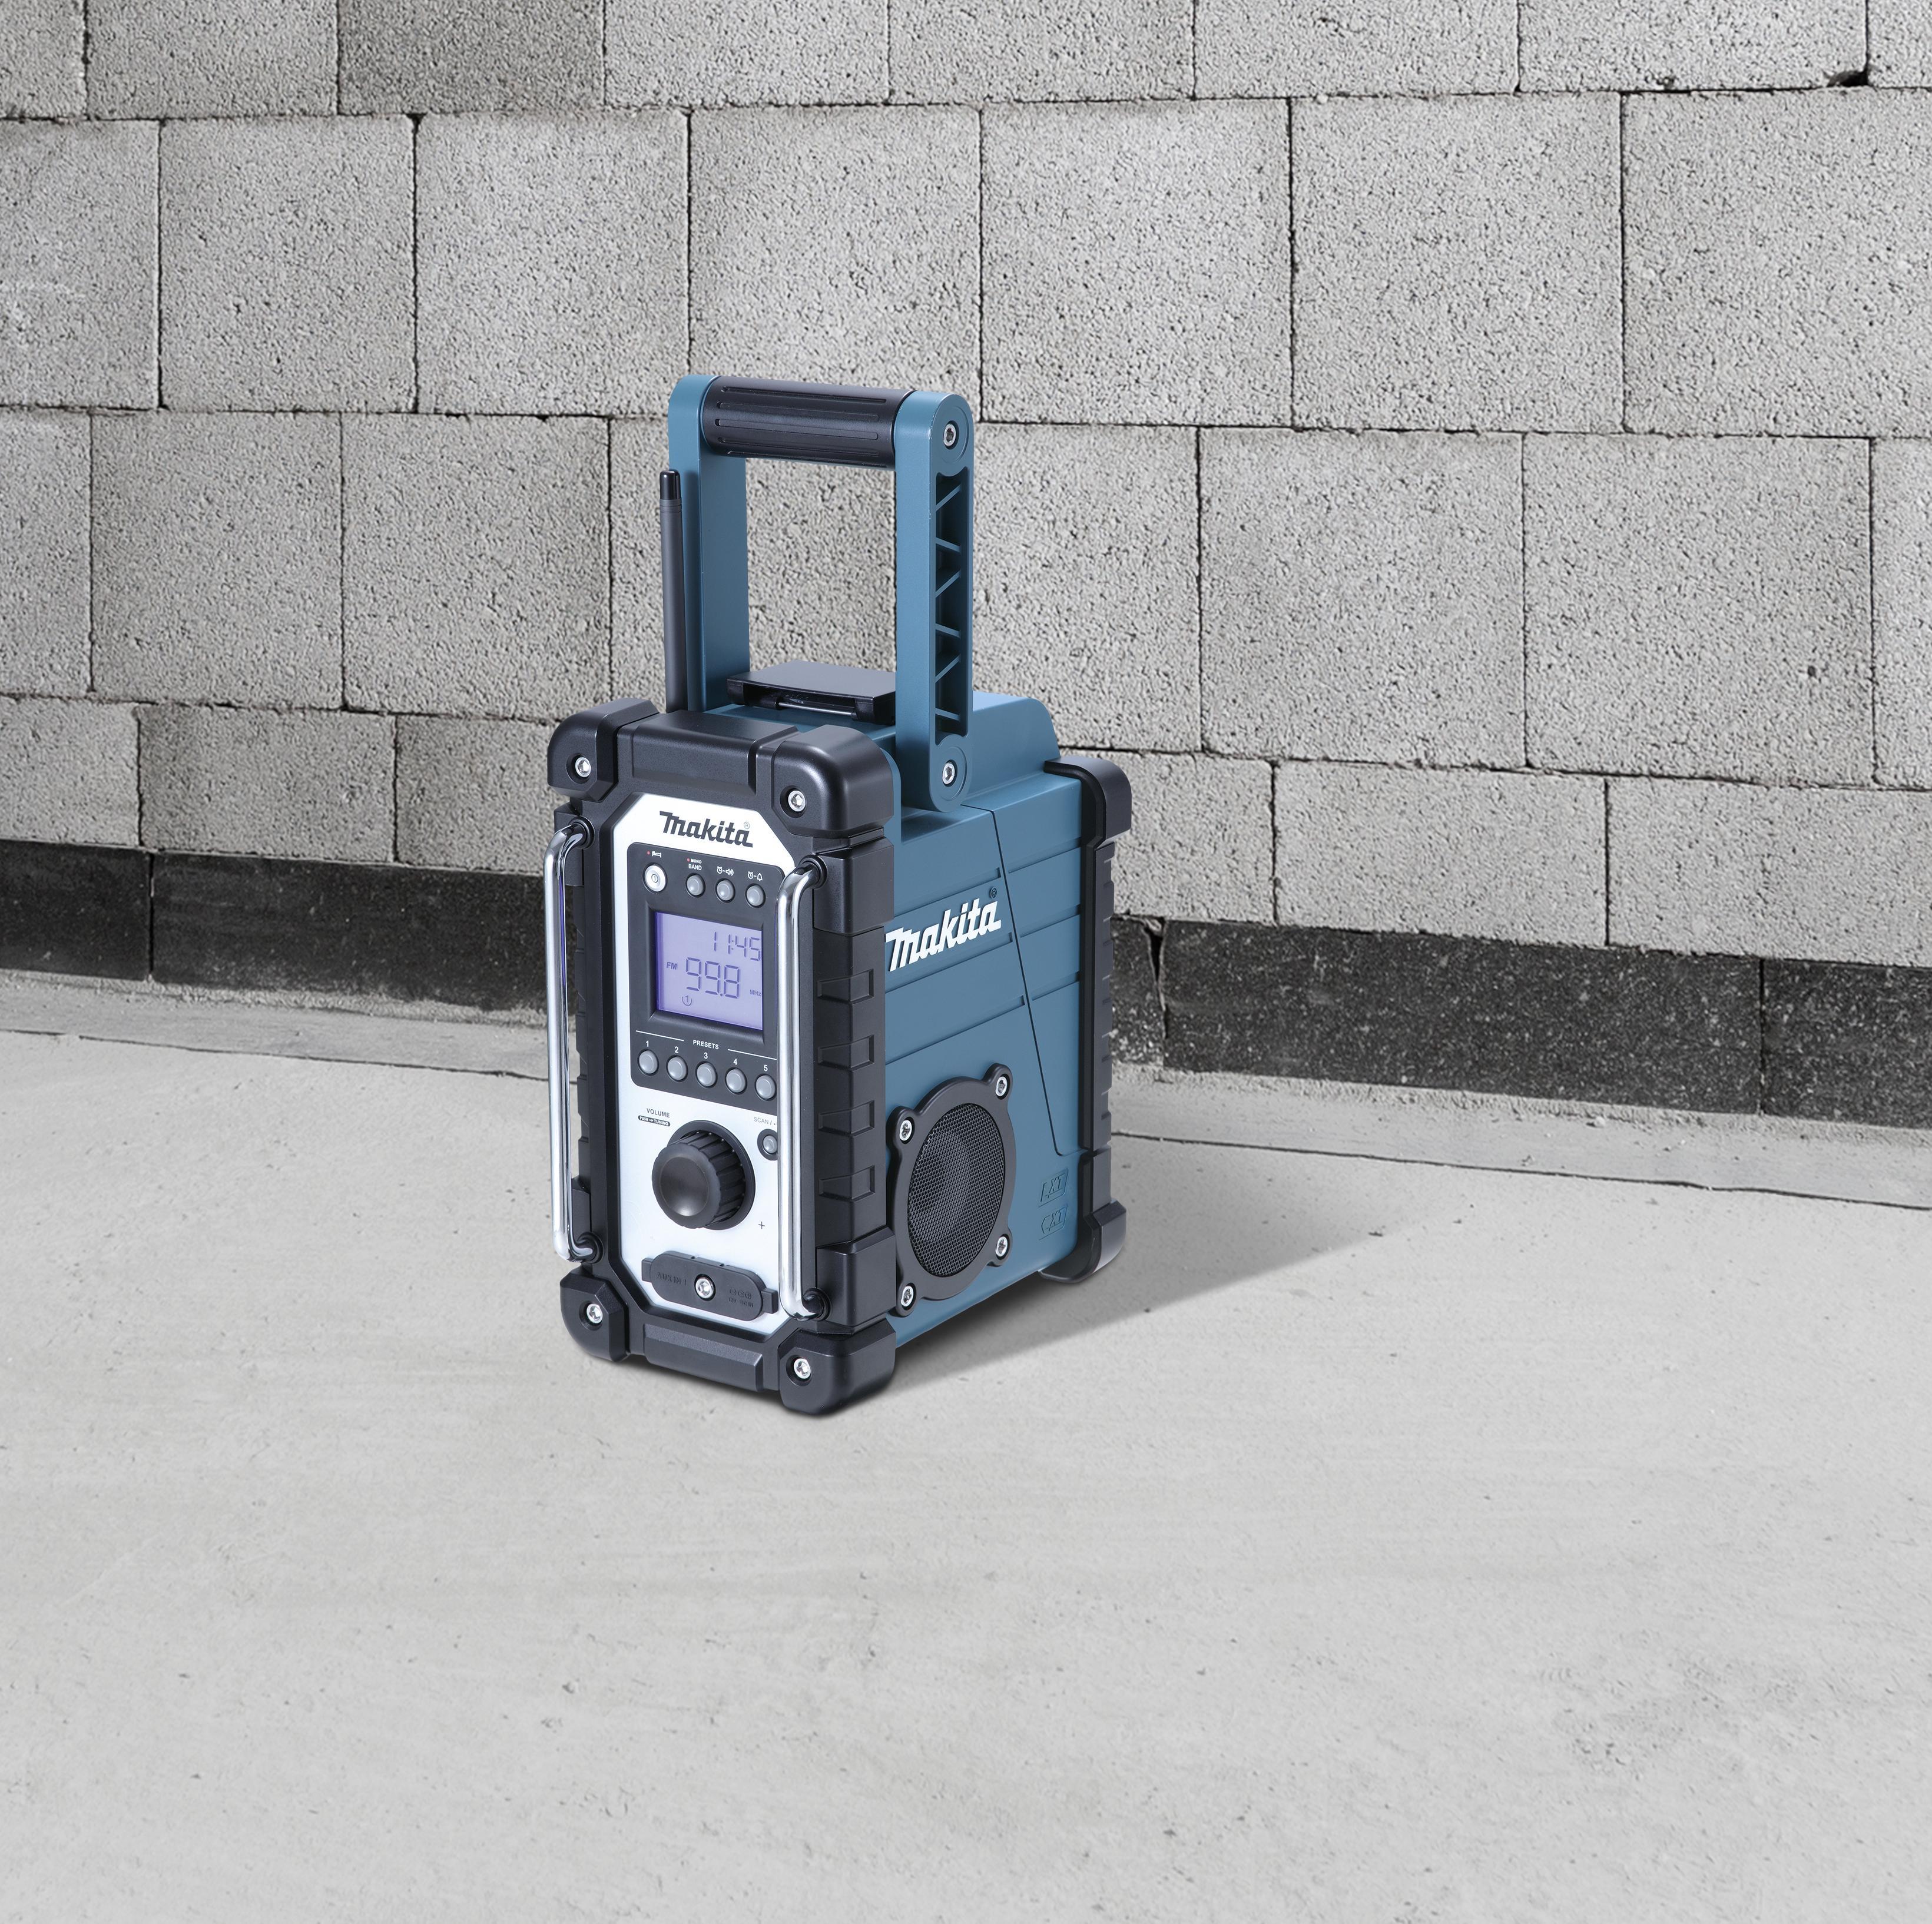 Akku baustellenradio dmr 107 werkzeuge kronen for Hagebaumarkt pool prospekt